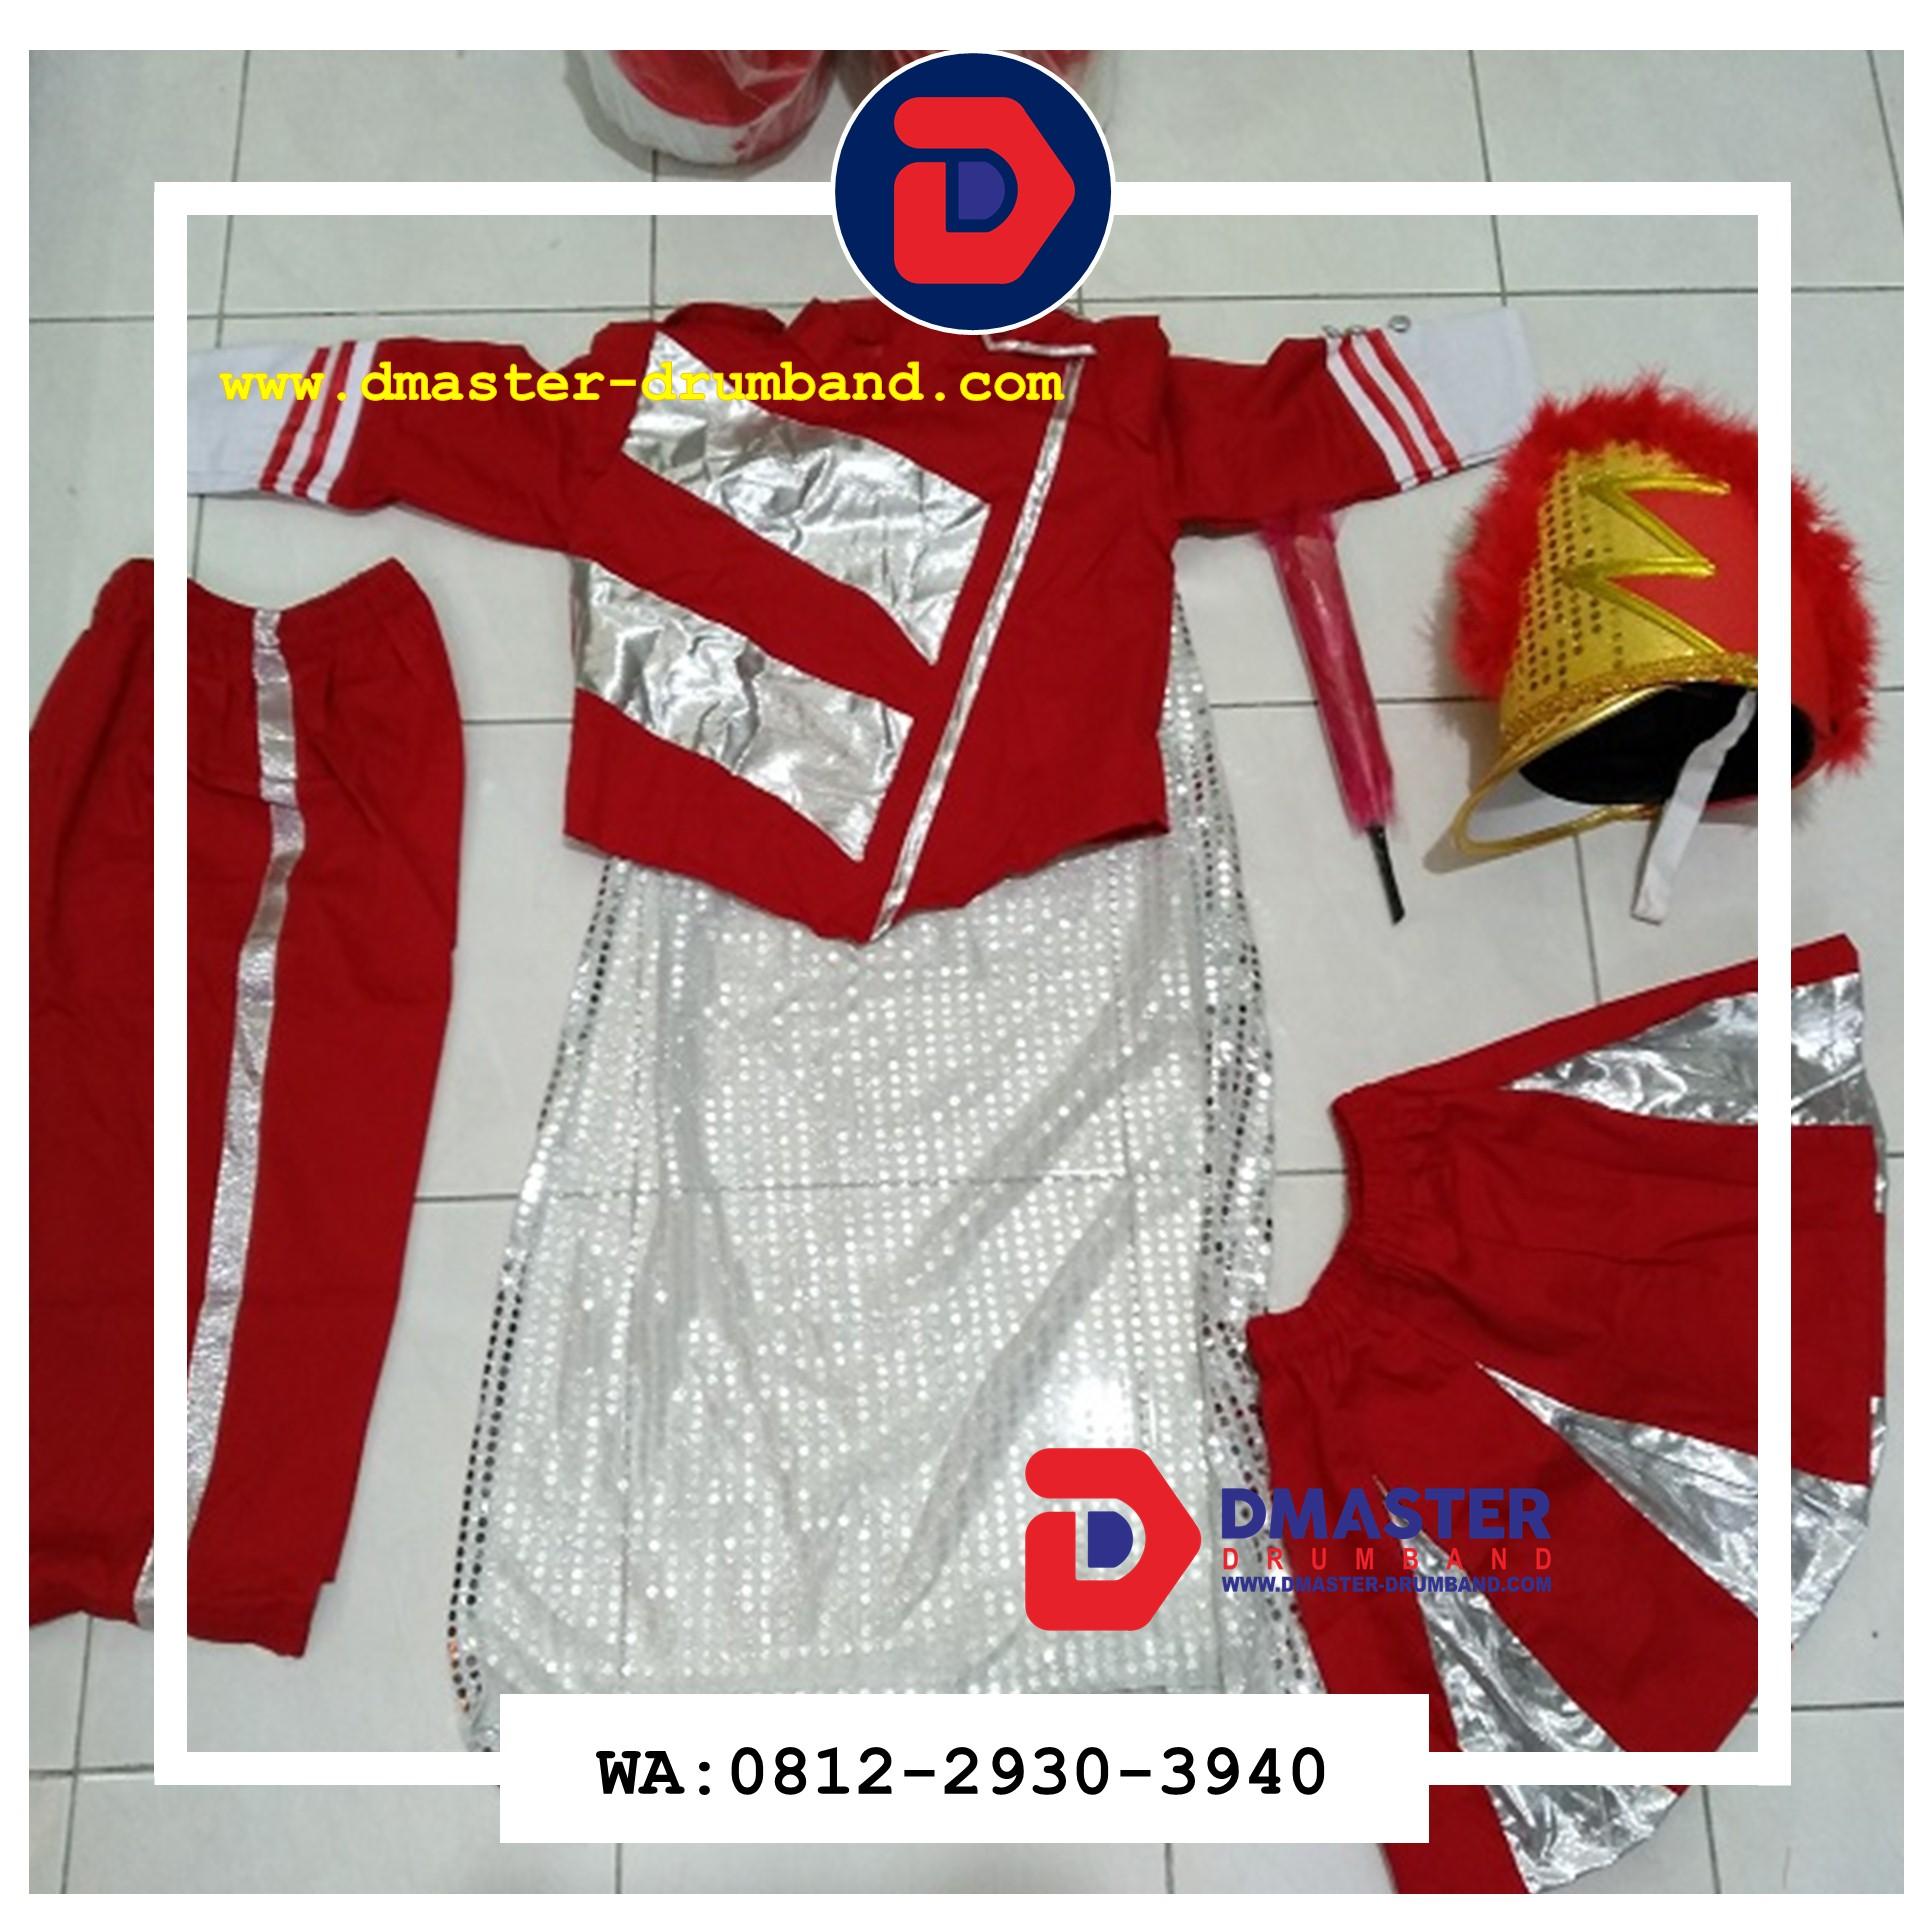 jual seragam, kostum, baju drumband | dmaster-drumband | wa.0812-2930-3940